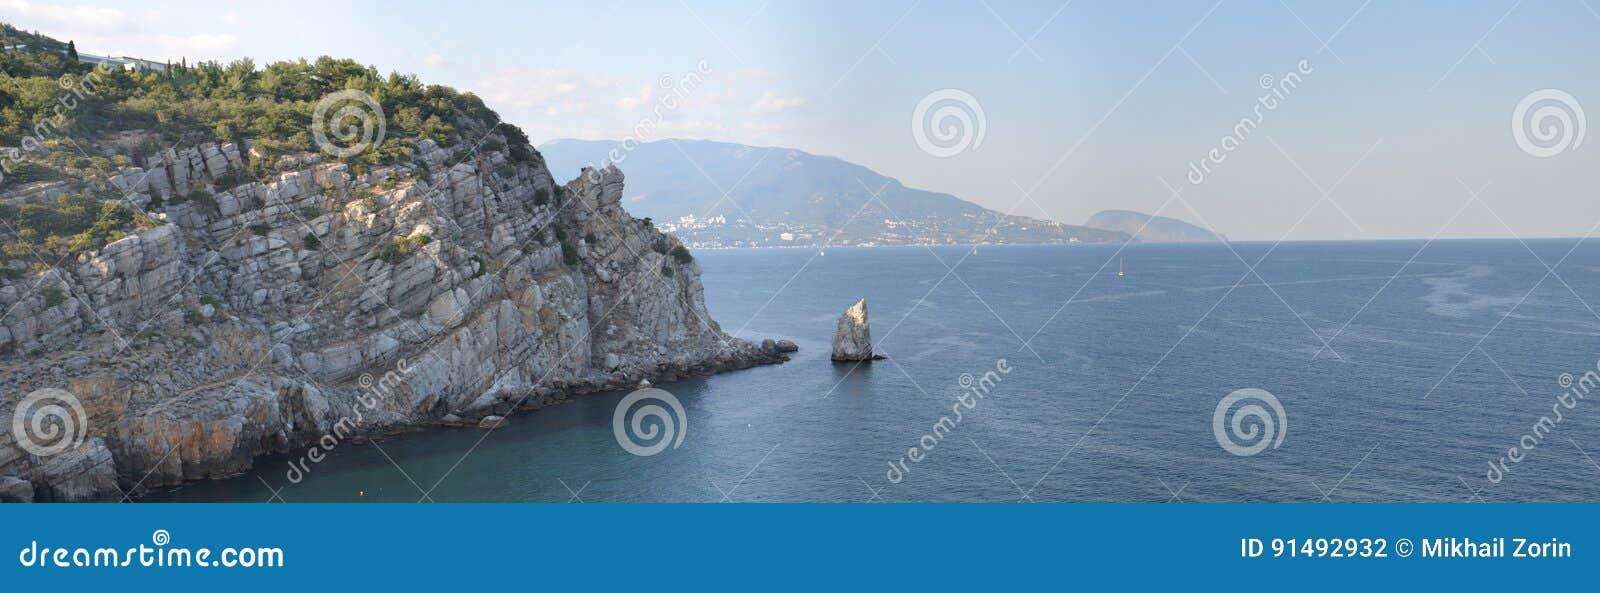 De promenade van Yalta